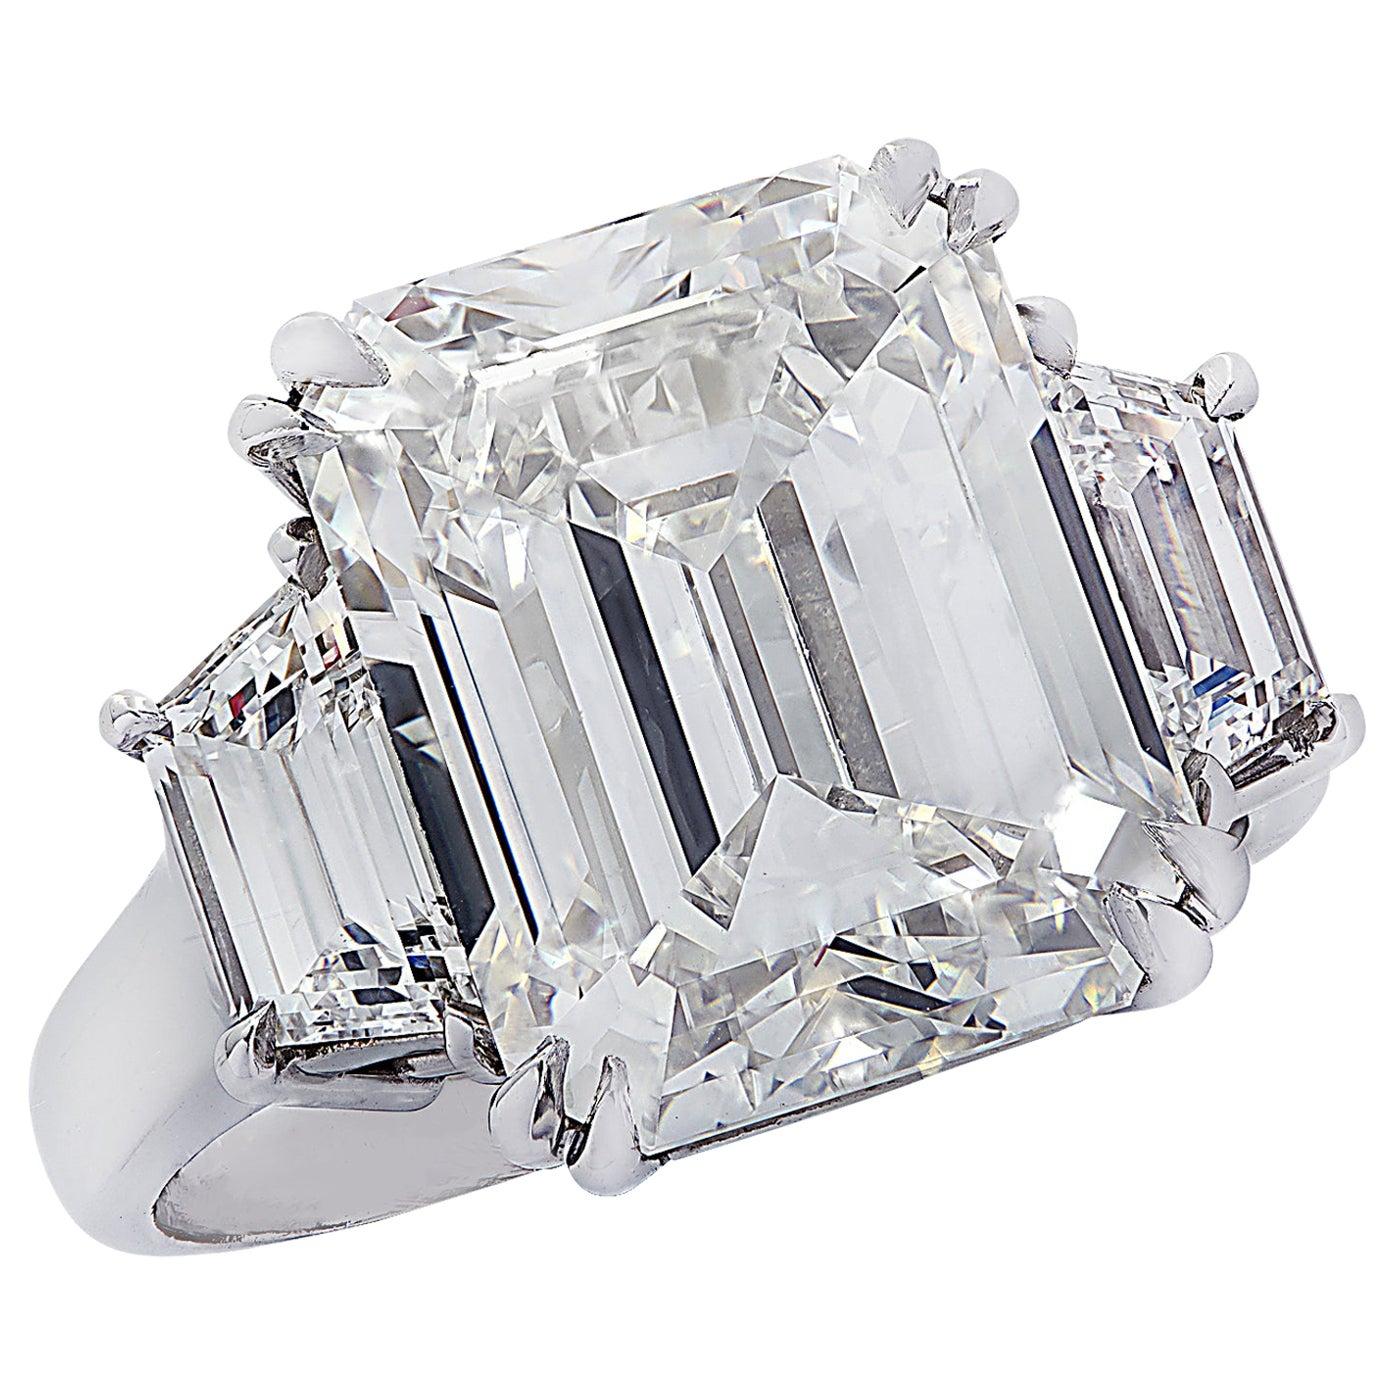 Vivid Diamonds GIA Certified 8.57 Carat Emerald Cut Diamond Engagement Ring